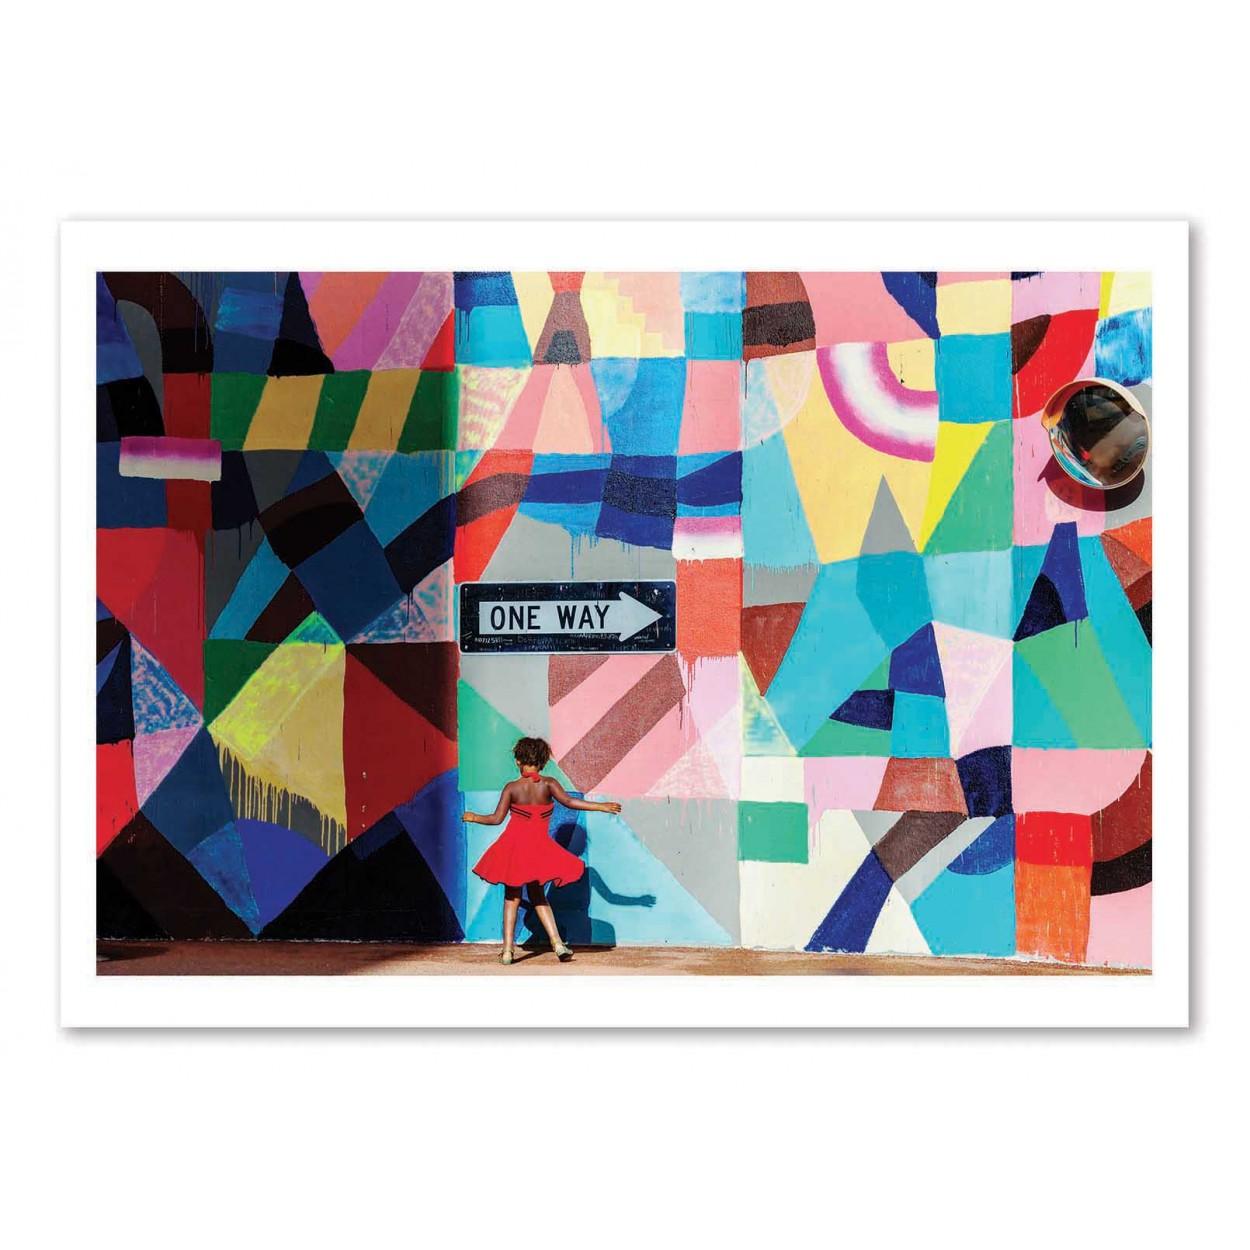 ONE WAY - GLORIA SALGADO GISPERT -  Affiche d'art 50 x 70 cm